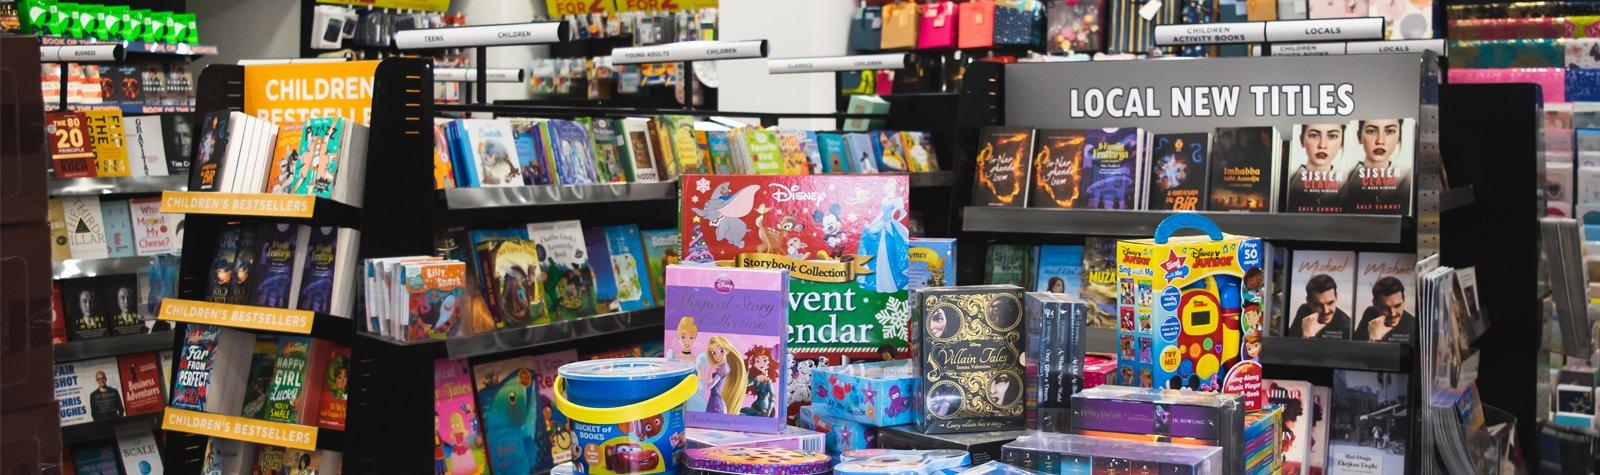 New Agenda Bookshop on Tower Road, Sliema